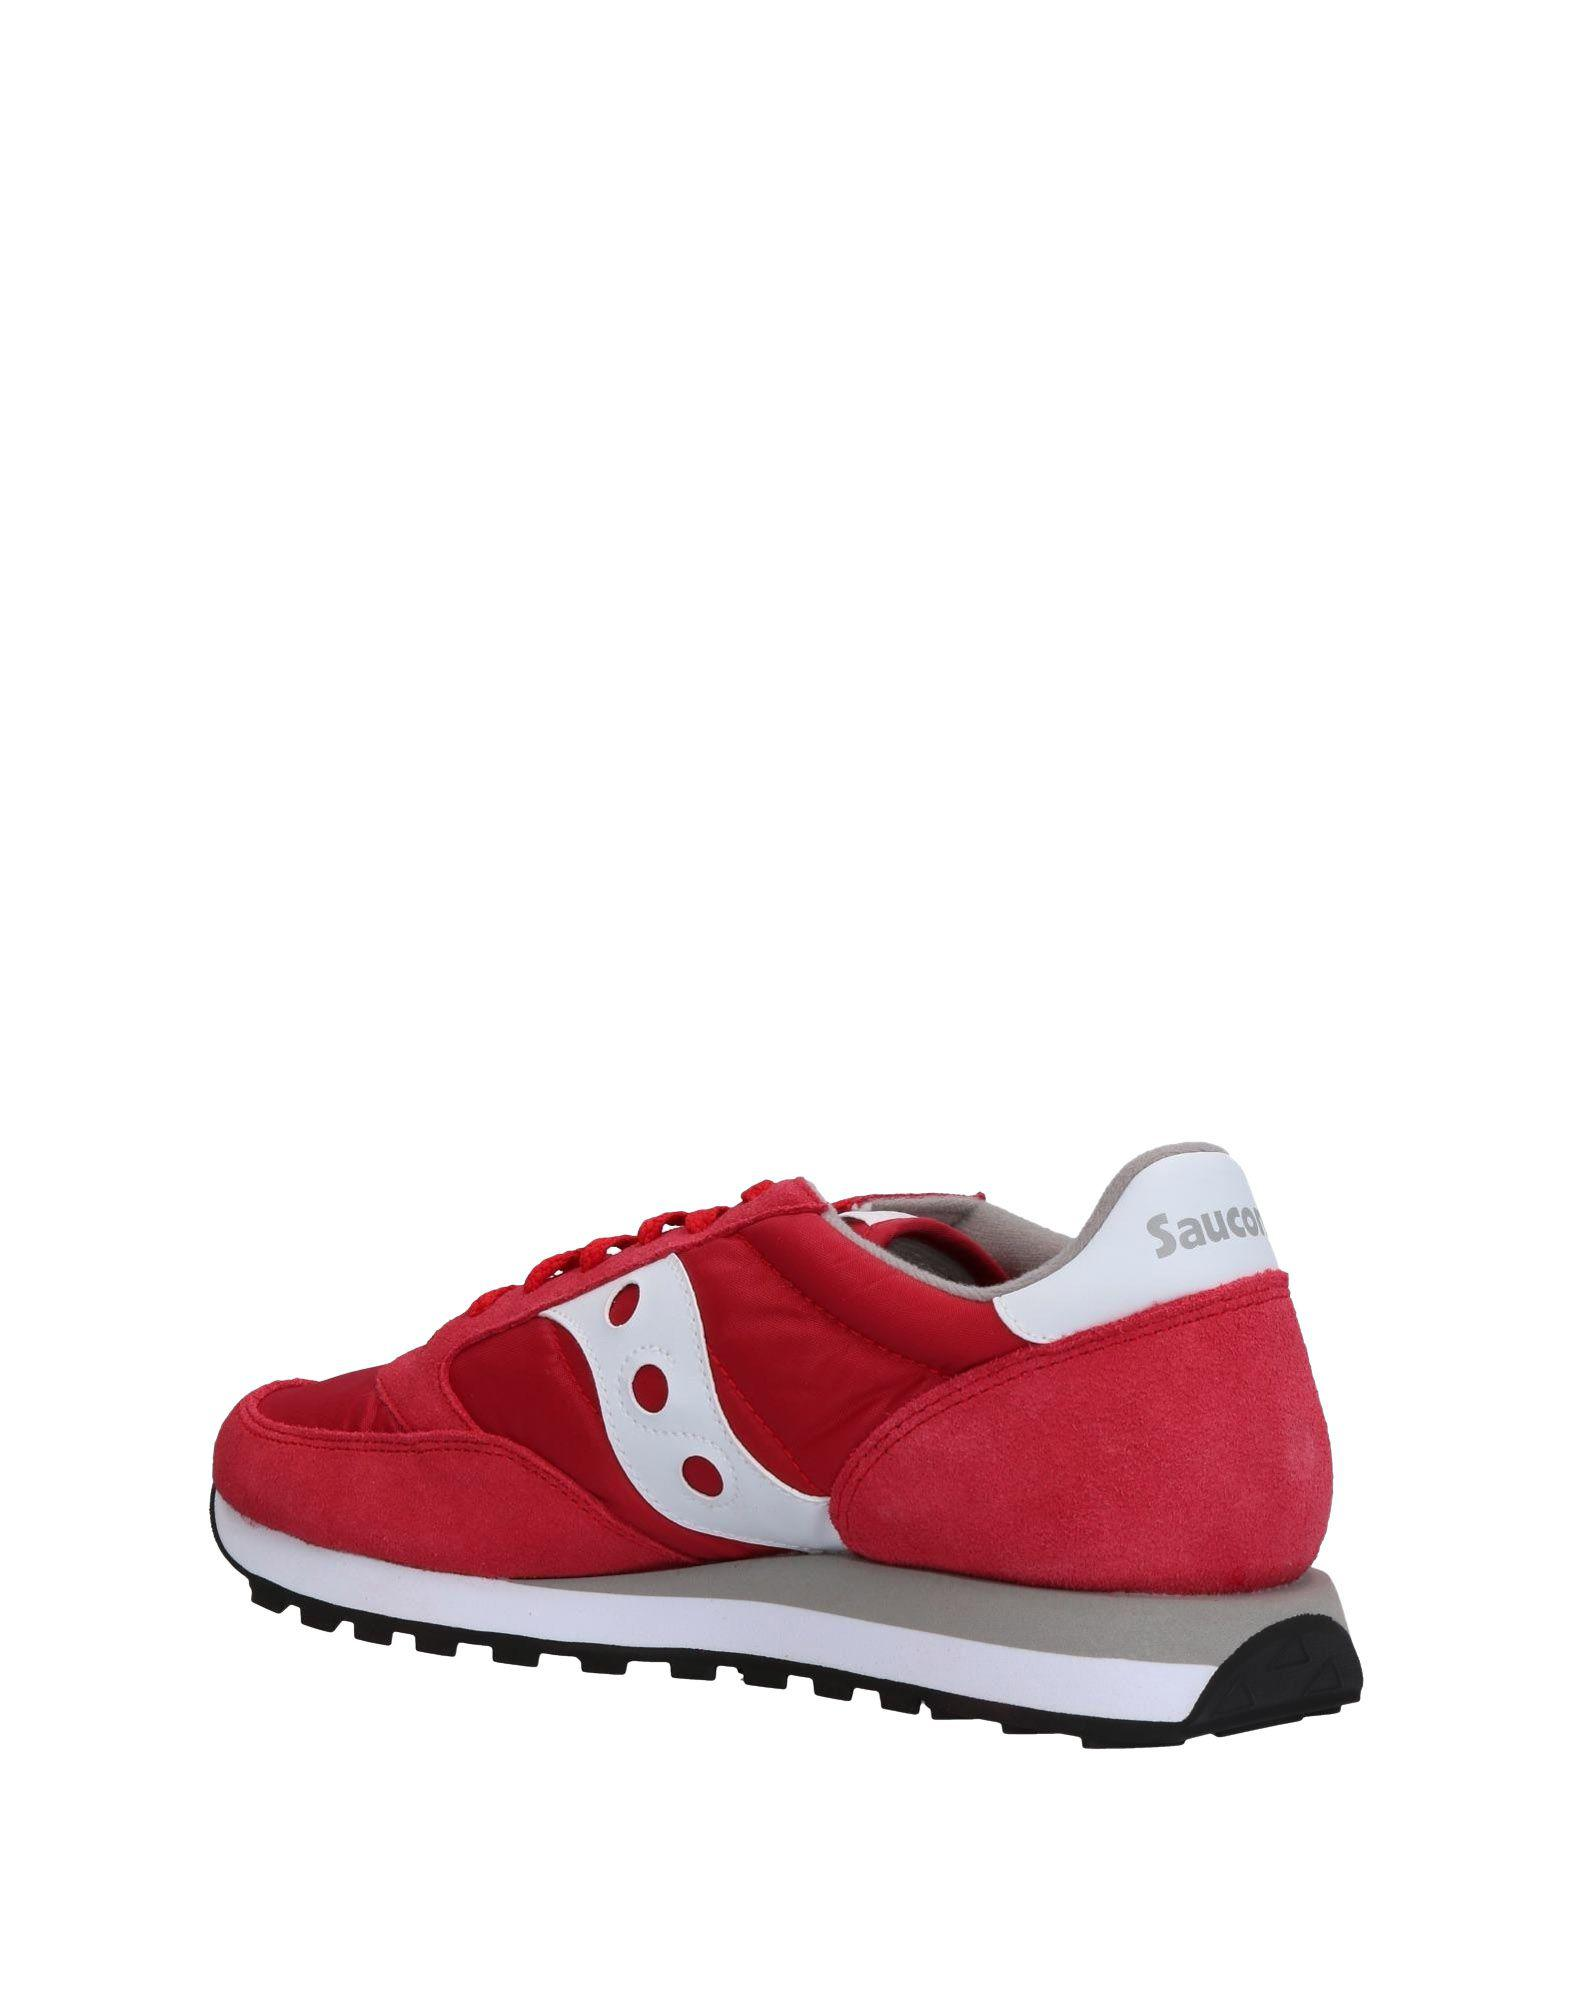 41703edd9aa0 Lyst - Saucony SAUCONY Sneaker jazz rossa in Red - Save 34%